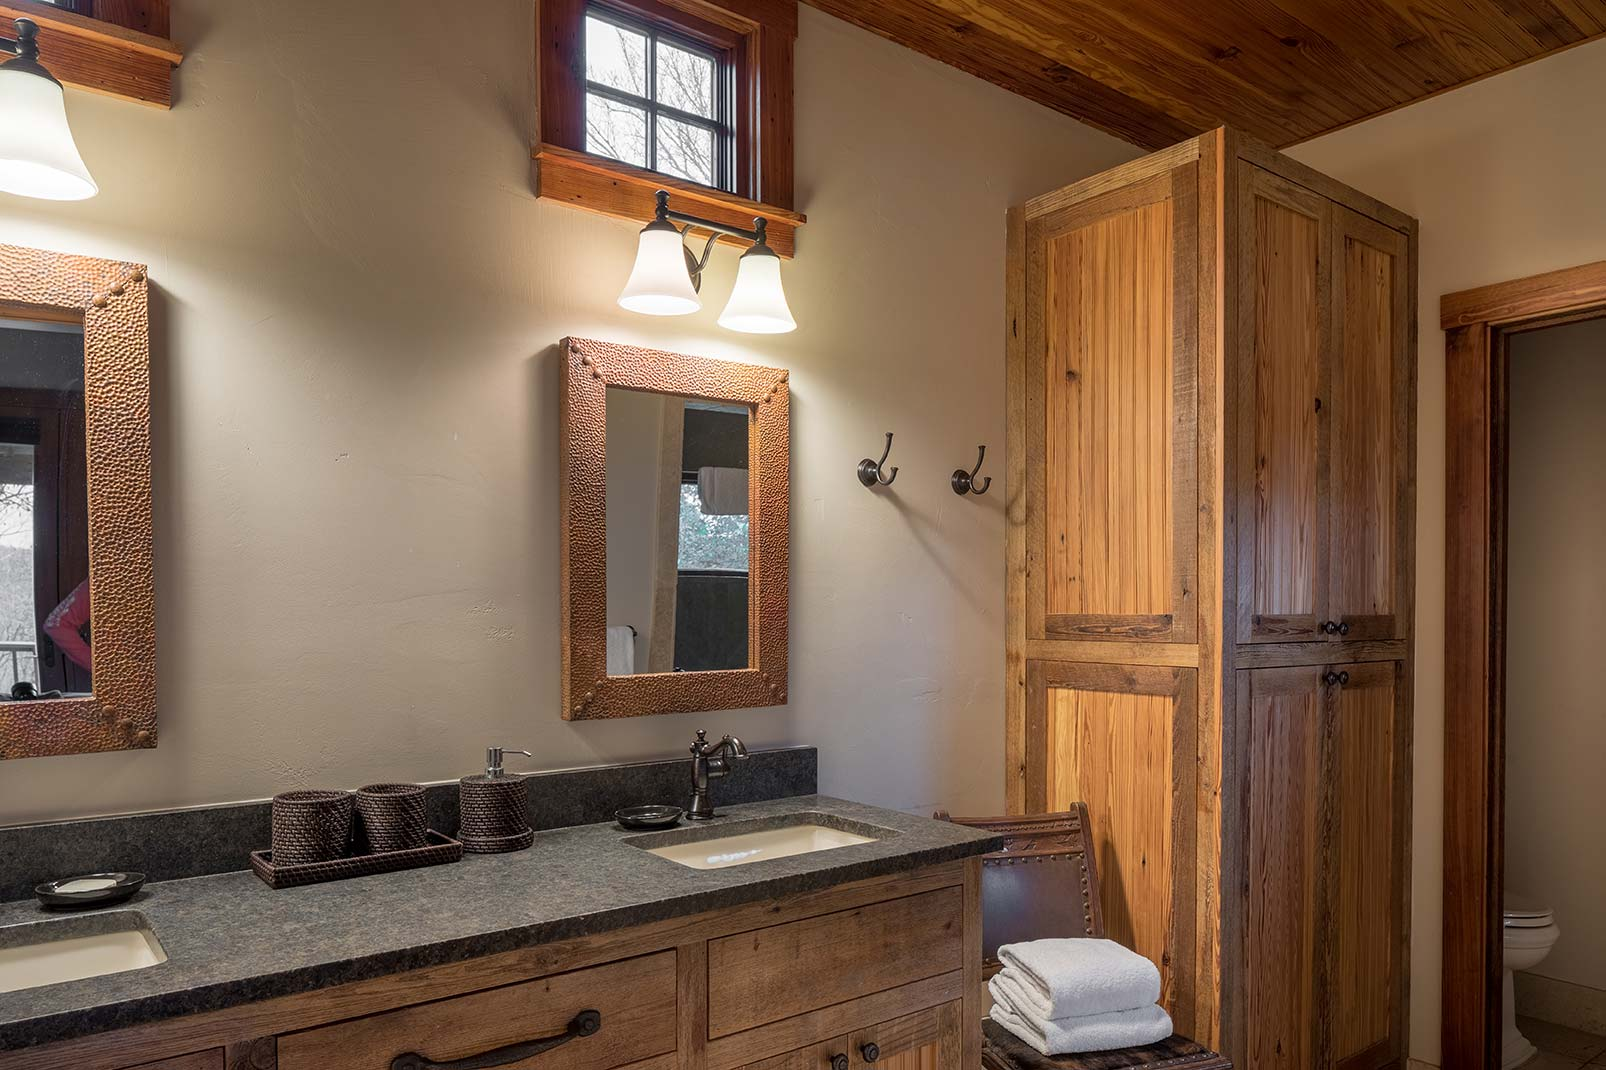 blacksmith-quarters-fredericksburg-realty-texas-commercial-real-estate-for-sale-bathroom-investment-spa.jpg